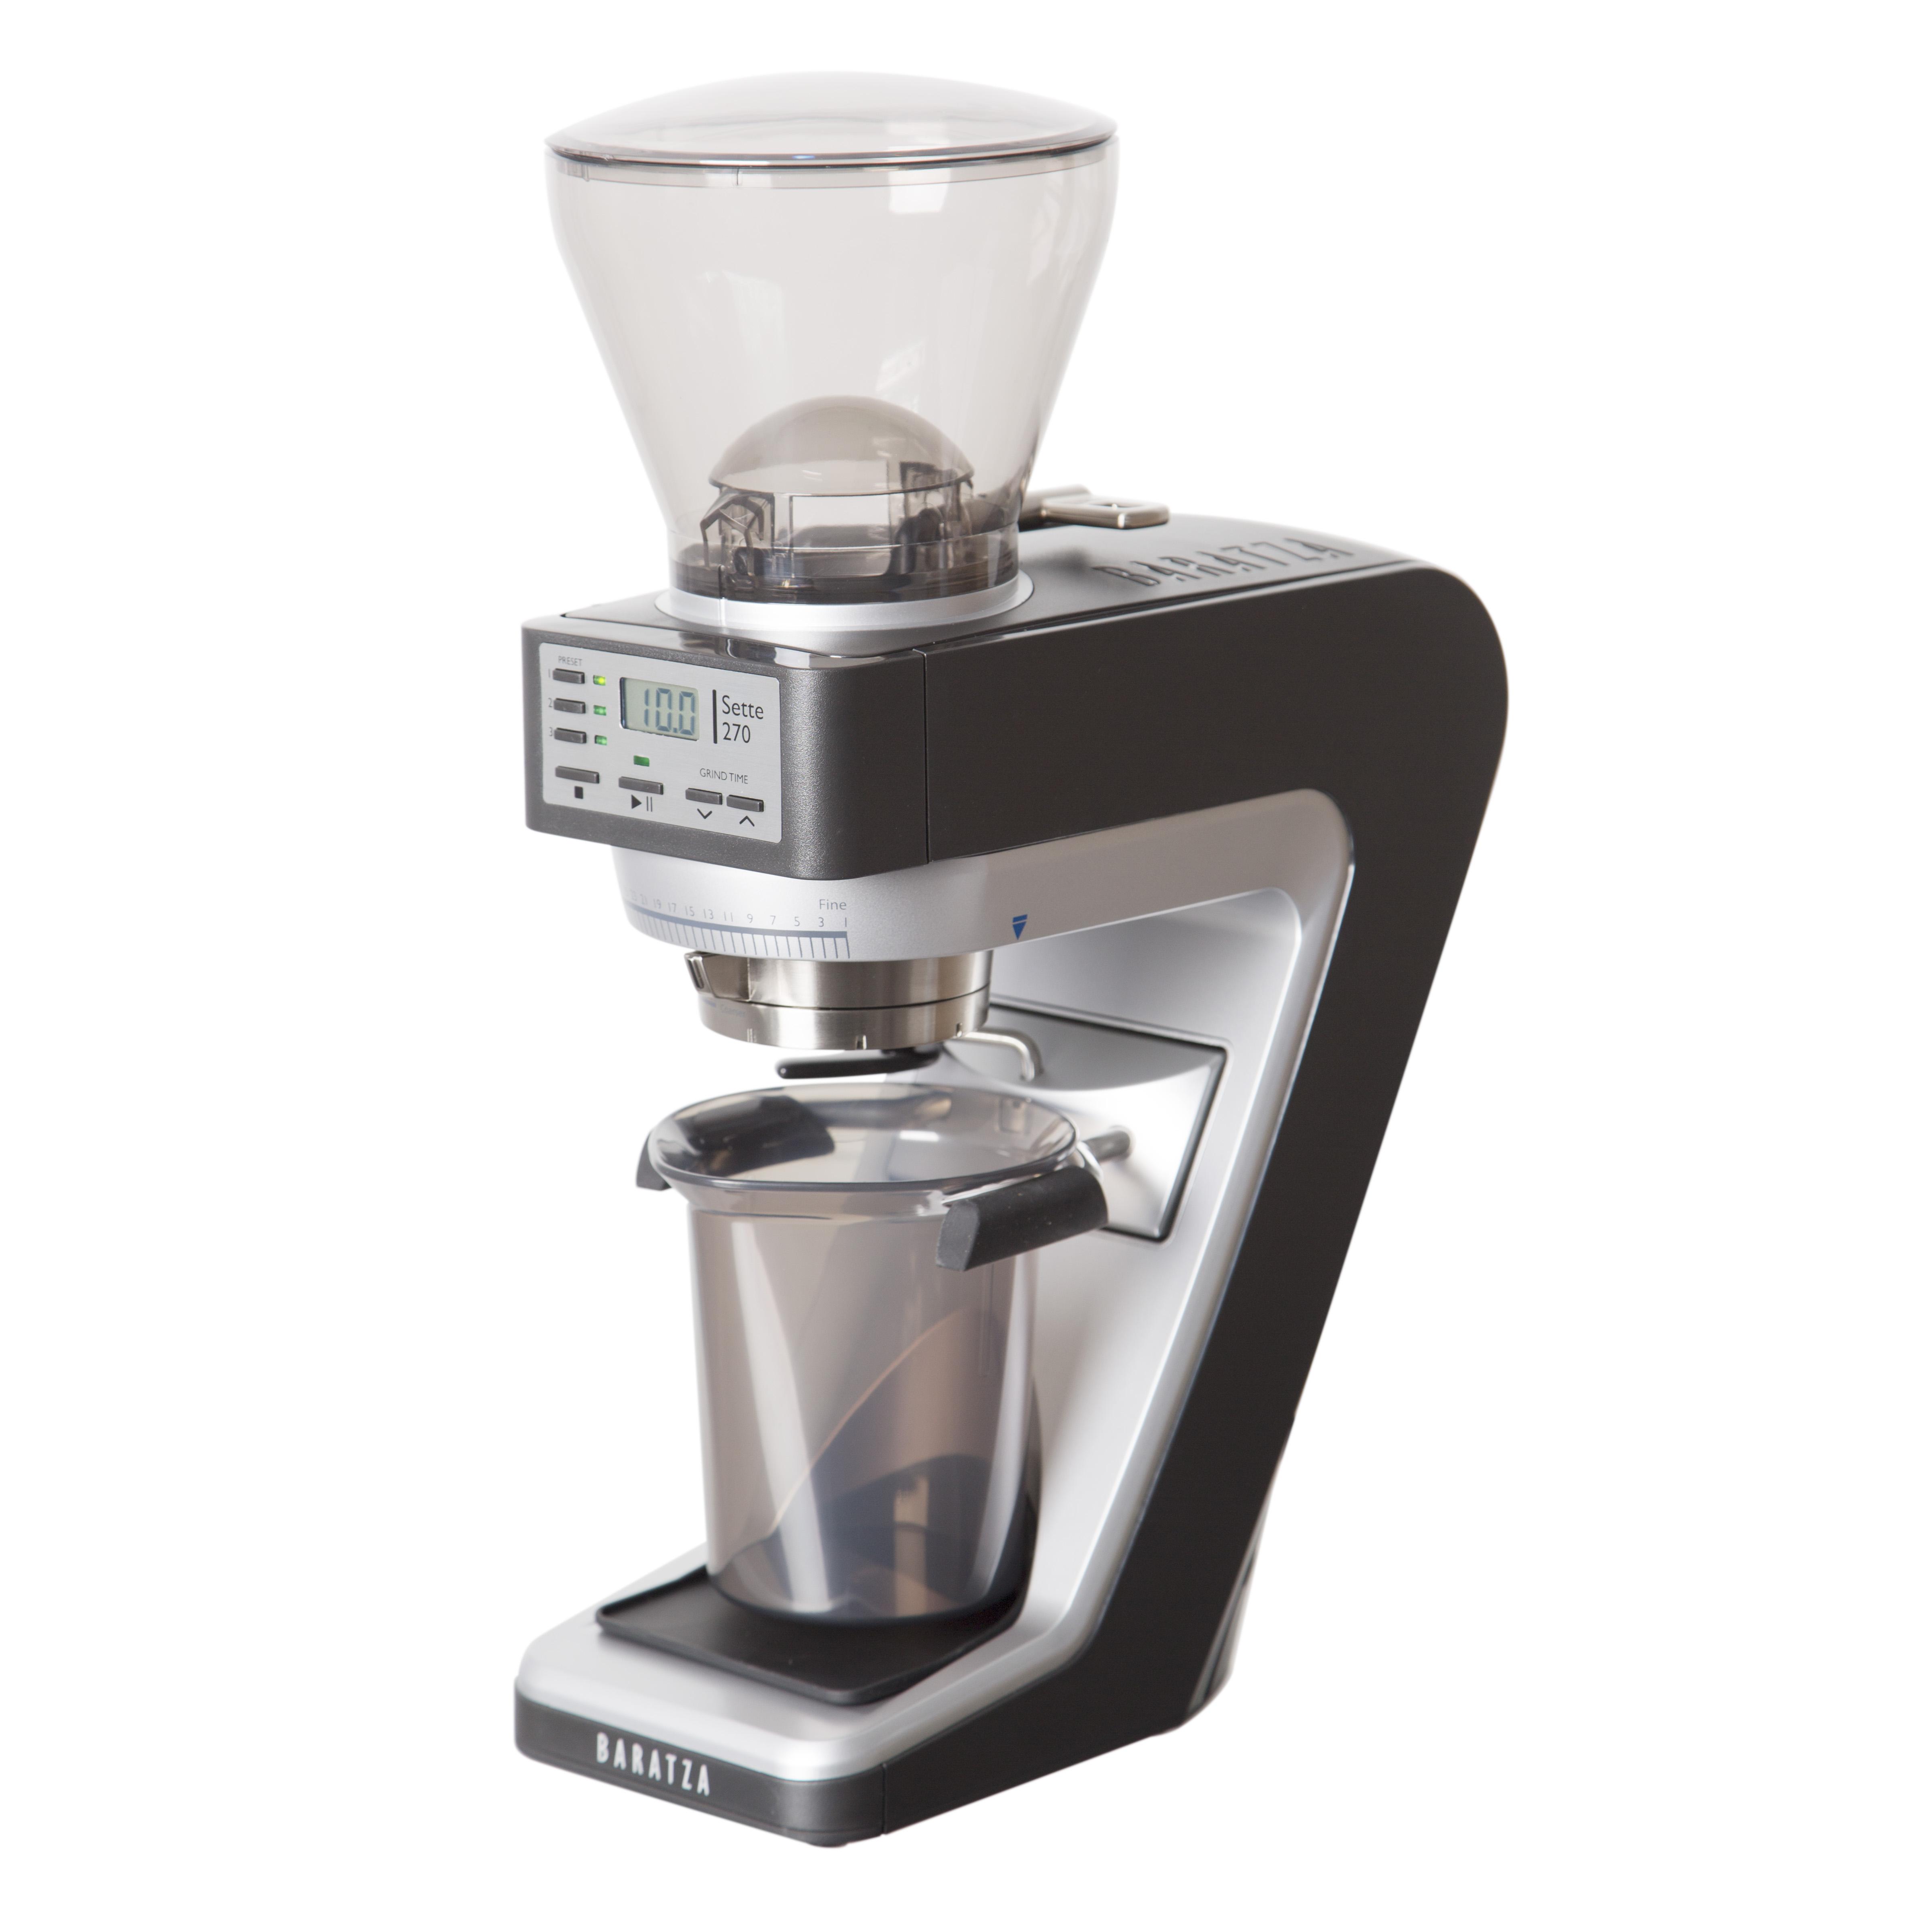 Baratza Sette 270 Espresso Grinder